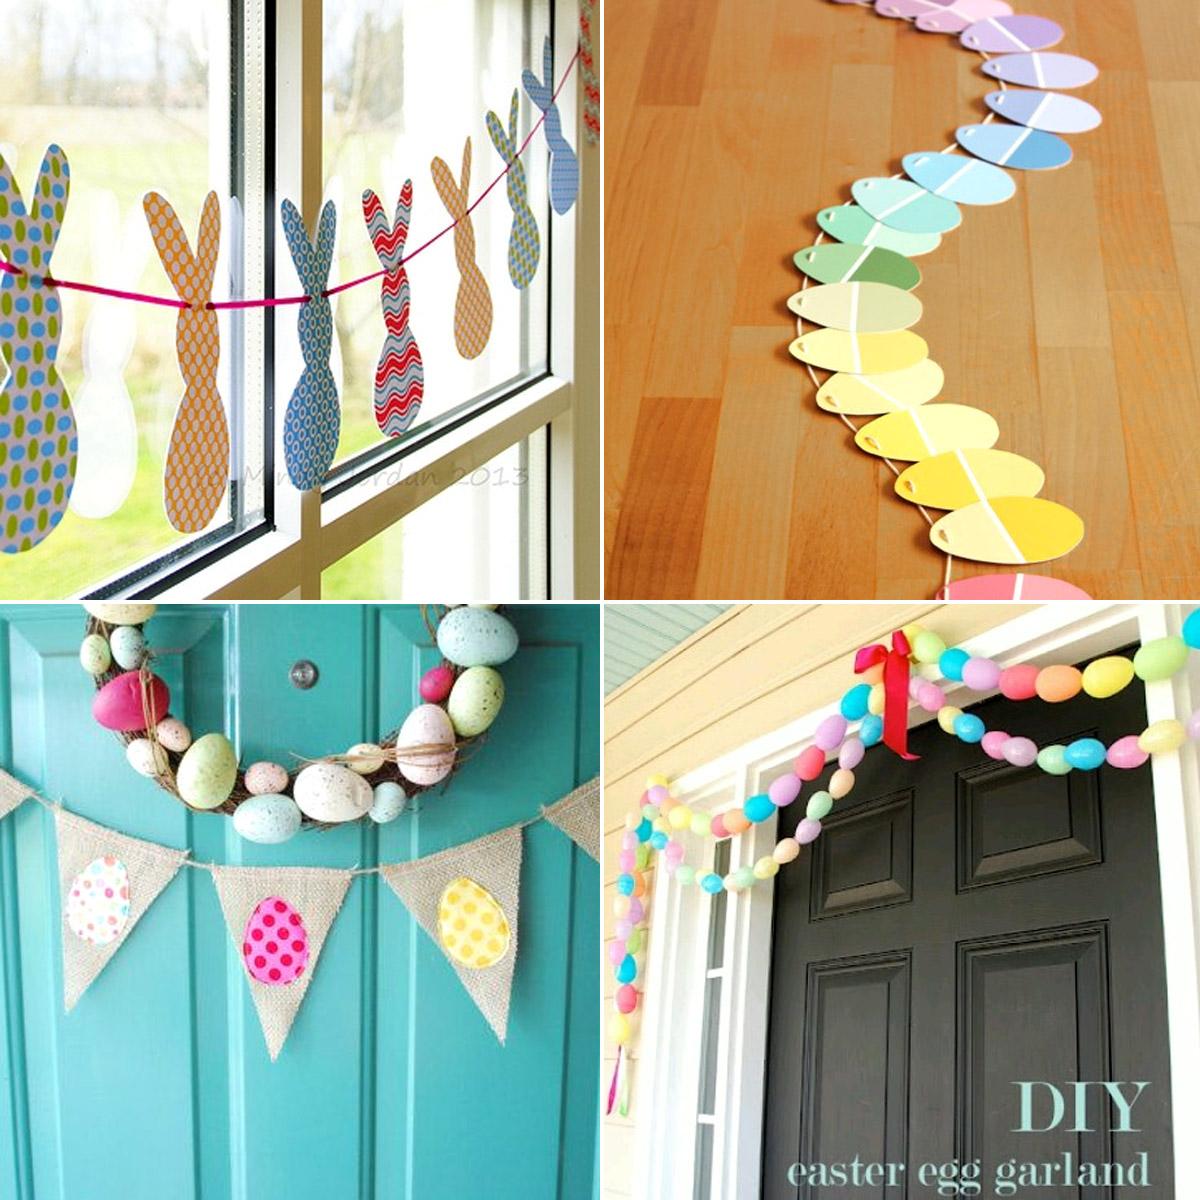 Wielkanocne DIY - girlanda